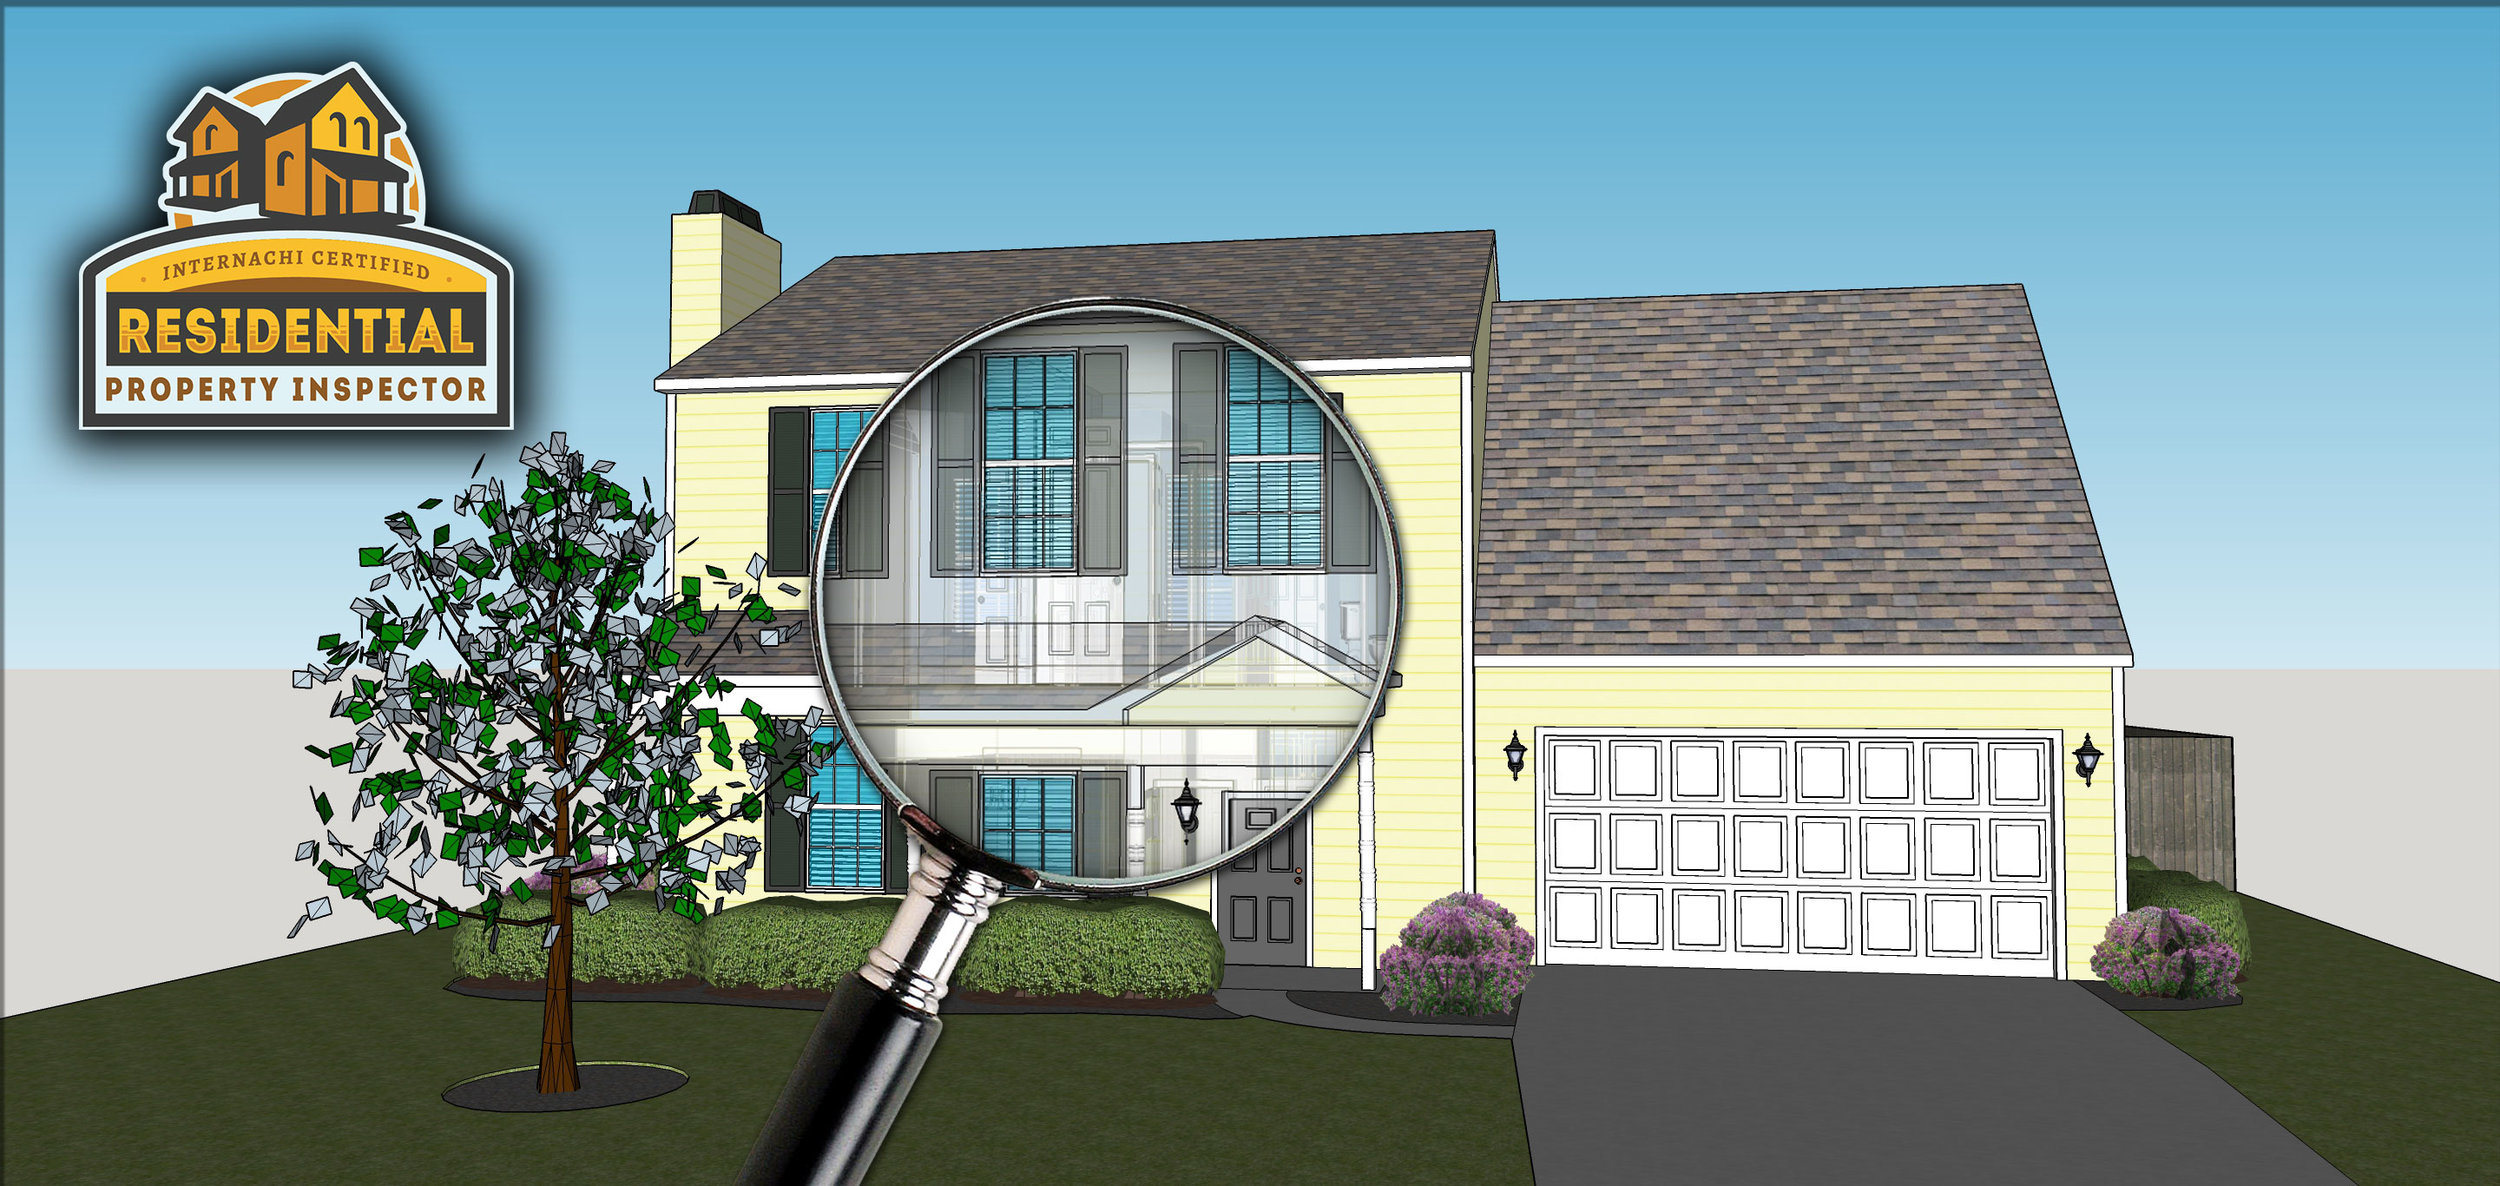 internachi-residential-property-inspector-2.jpg